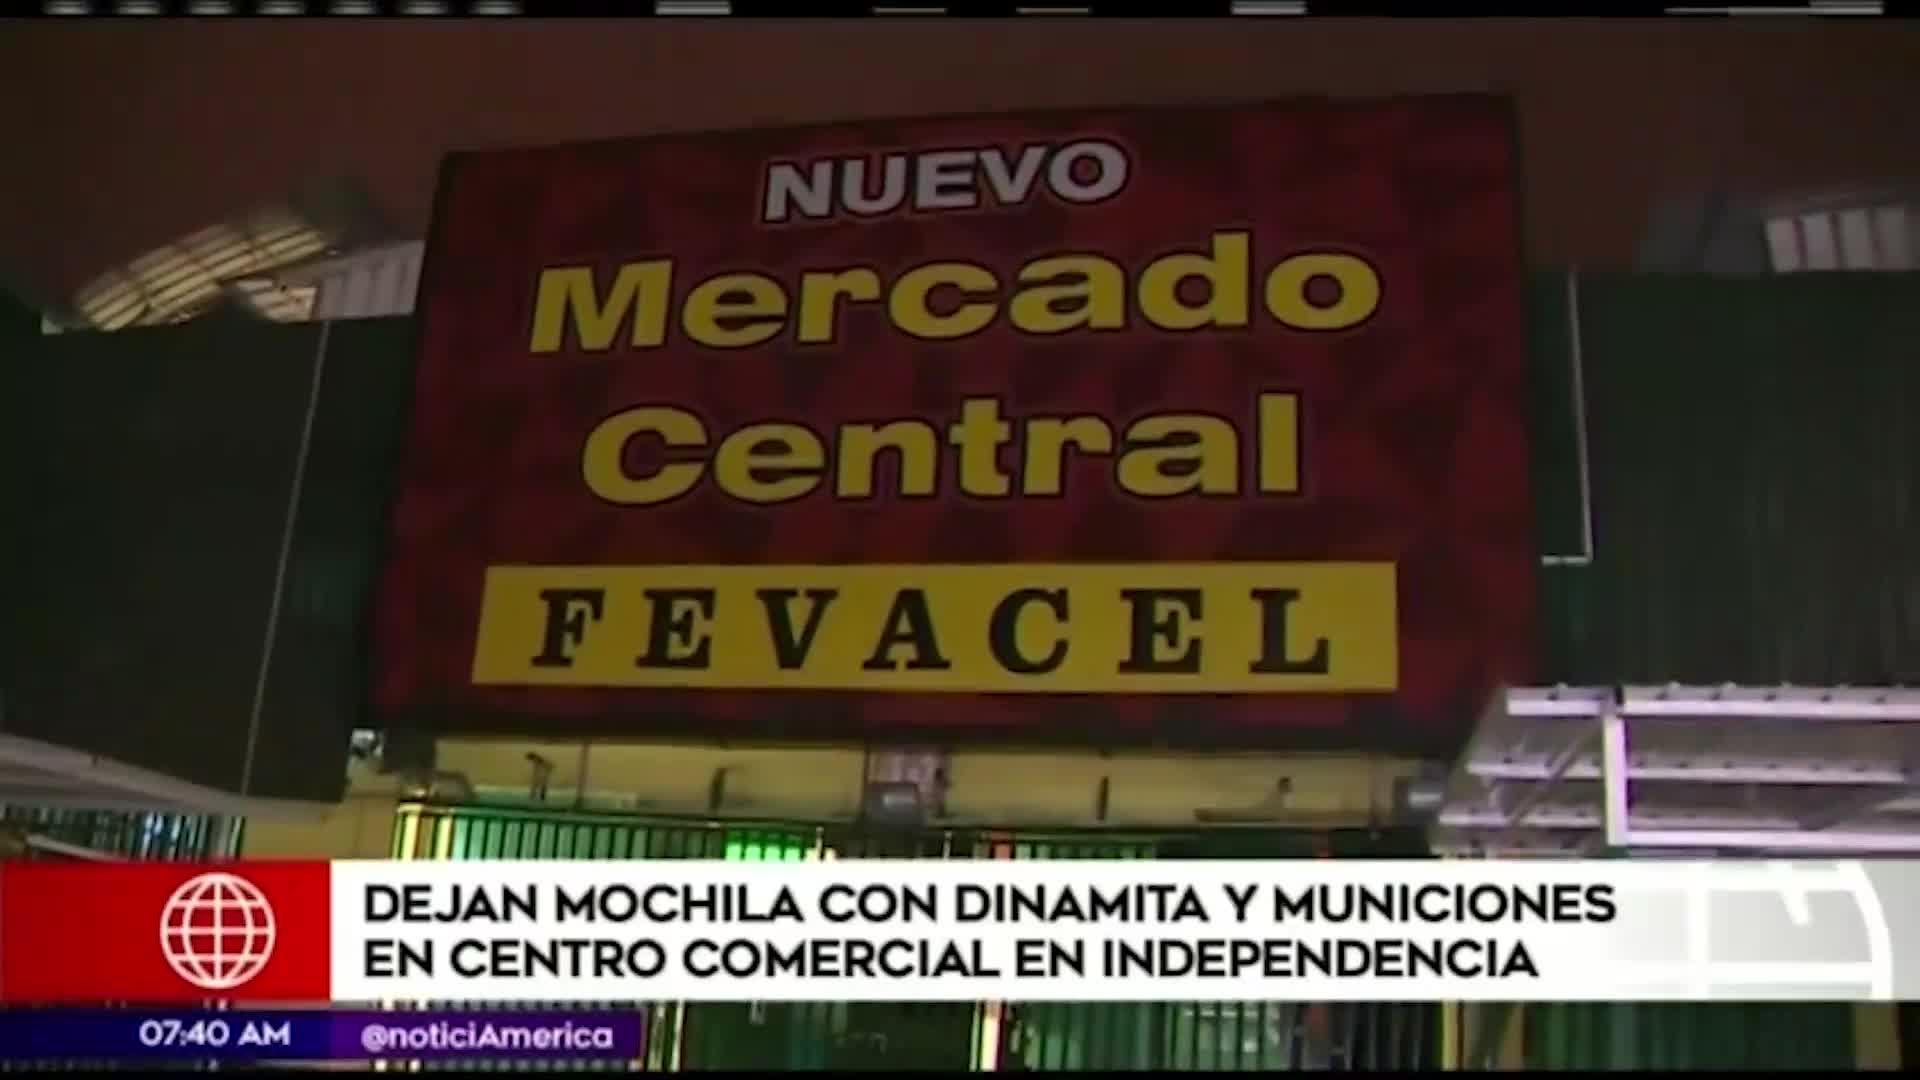 Independencia: hallan mochila con dinamita en centro comercial